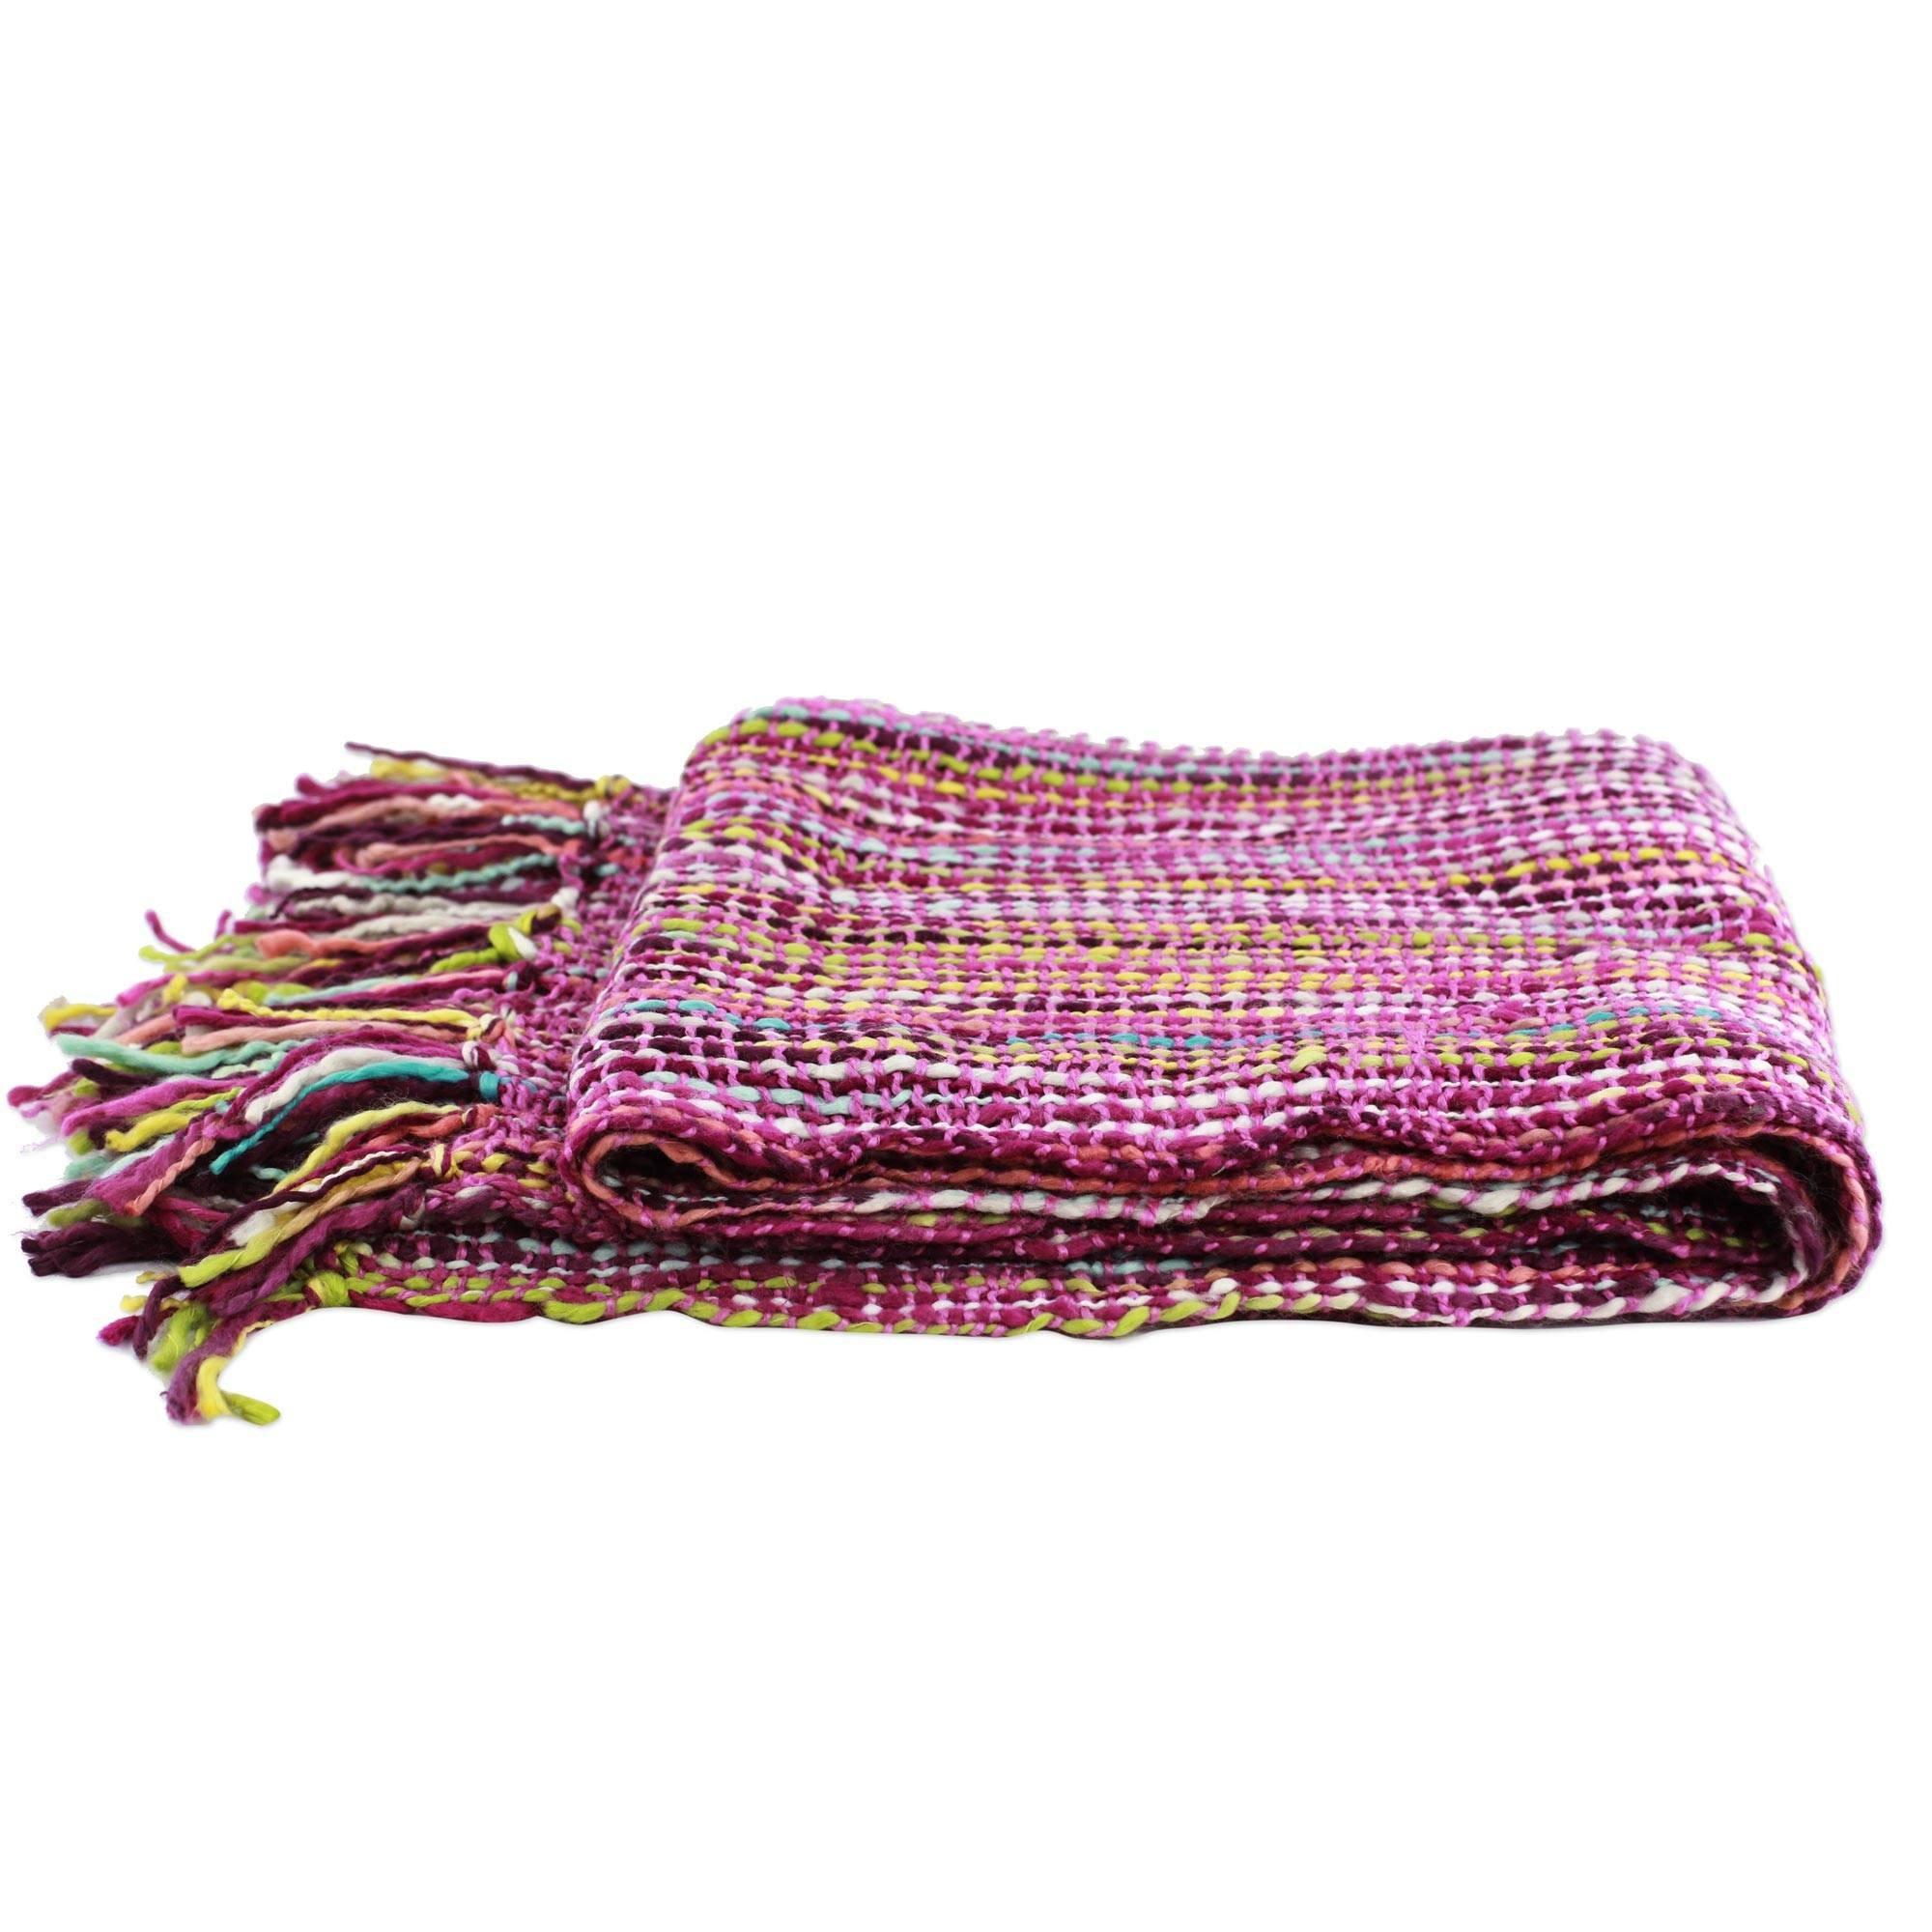 NOVICA PT063 Bright Purple Colorful Rainbow Woven Sofa Throw Blanket 'Joyous Amethyst', Pink Multicolor